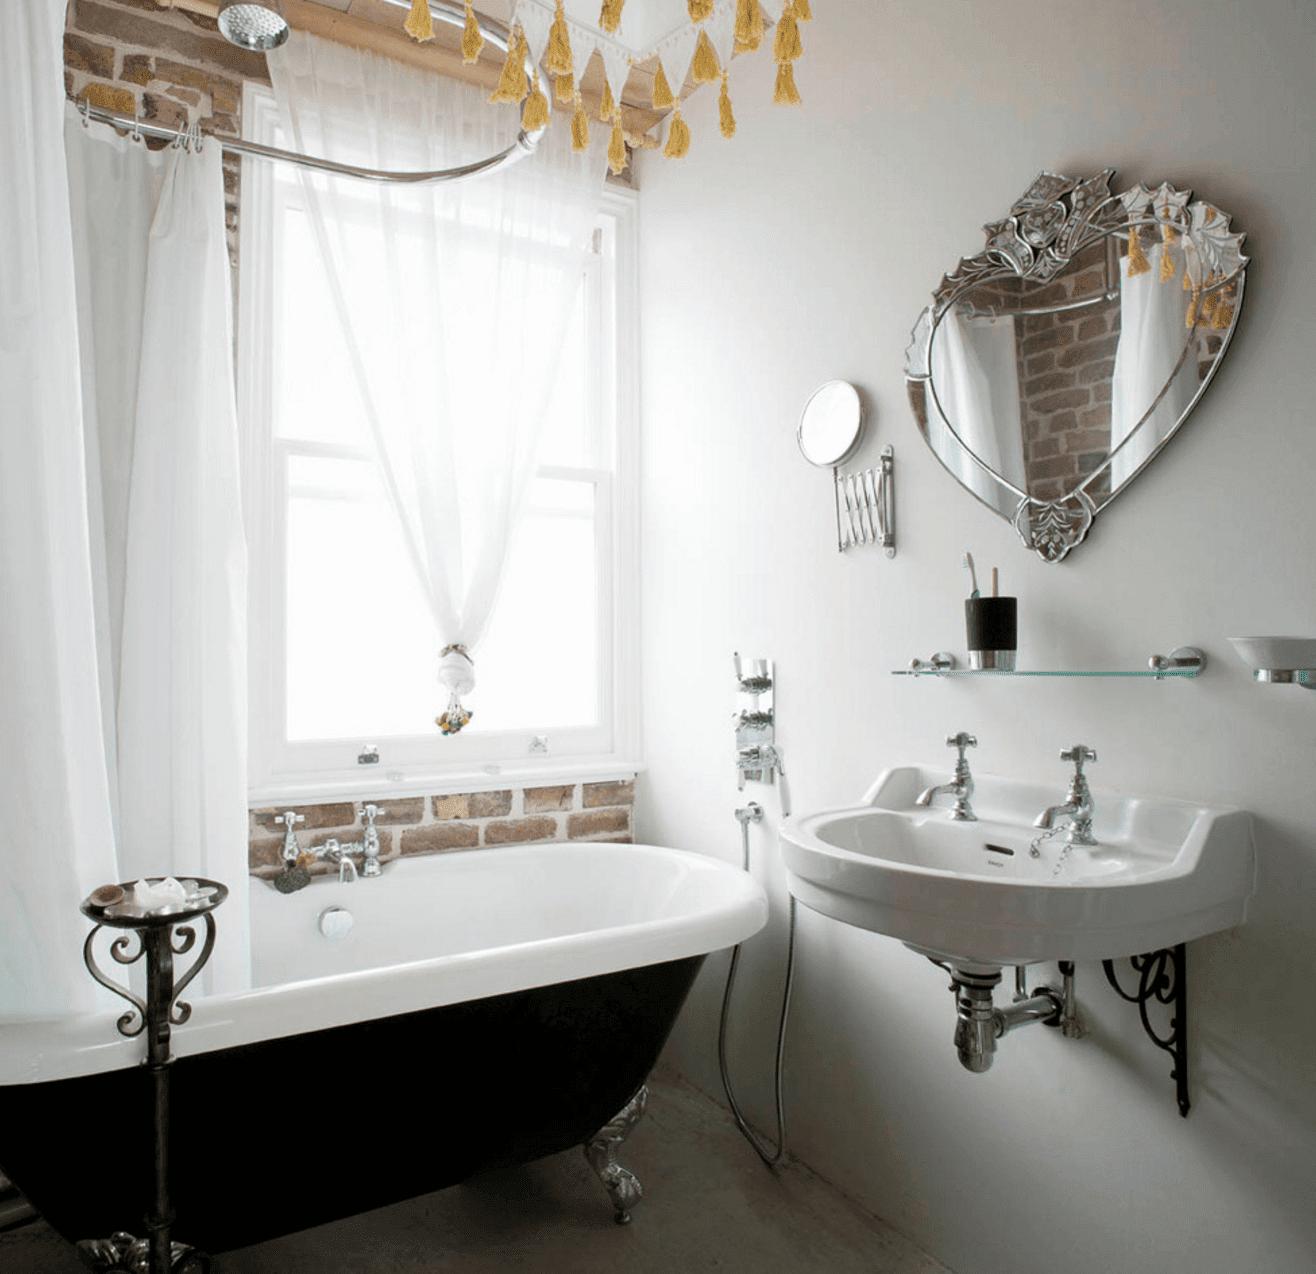 Quirky Bathroom Mirrors 100+ [ mirror for bathroom ideas ] | bathroom bathroom floor